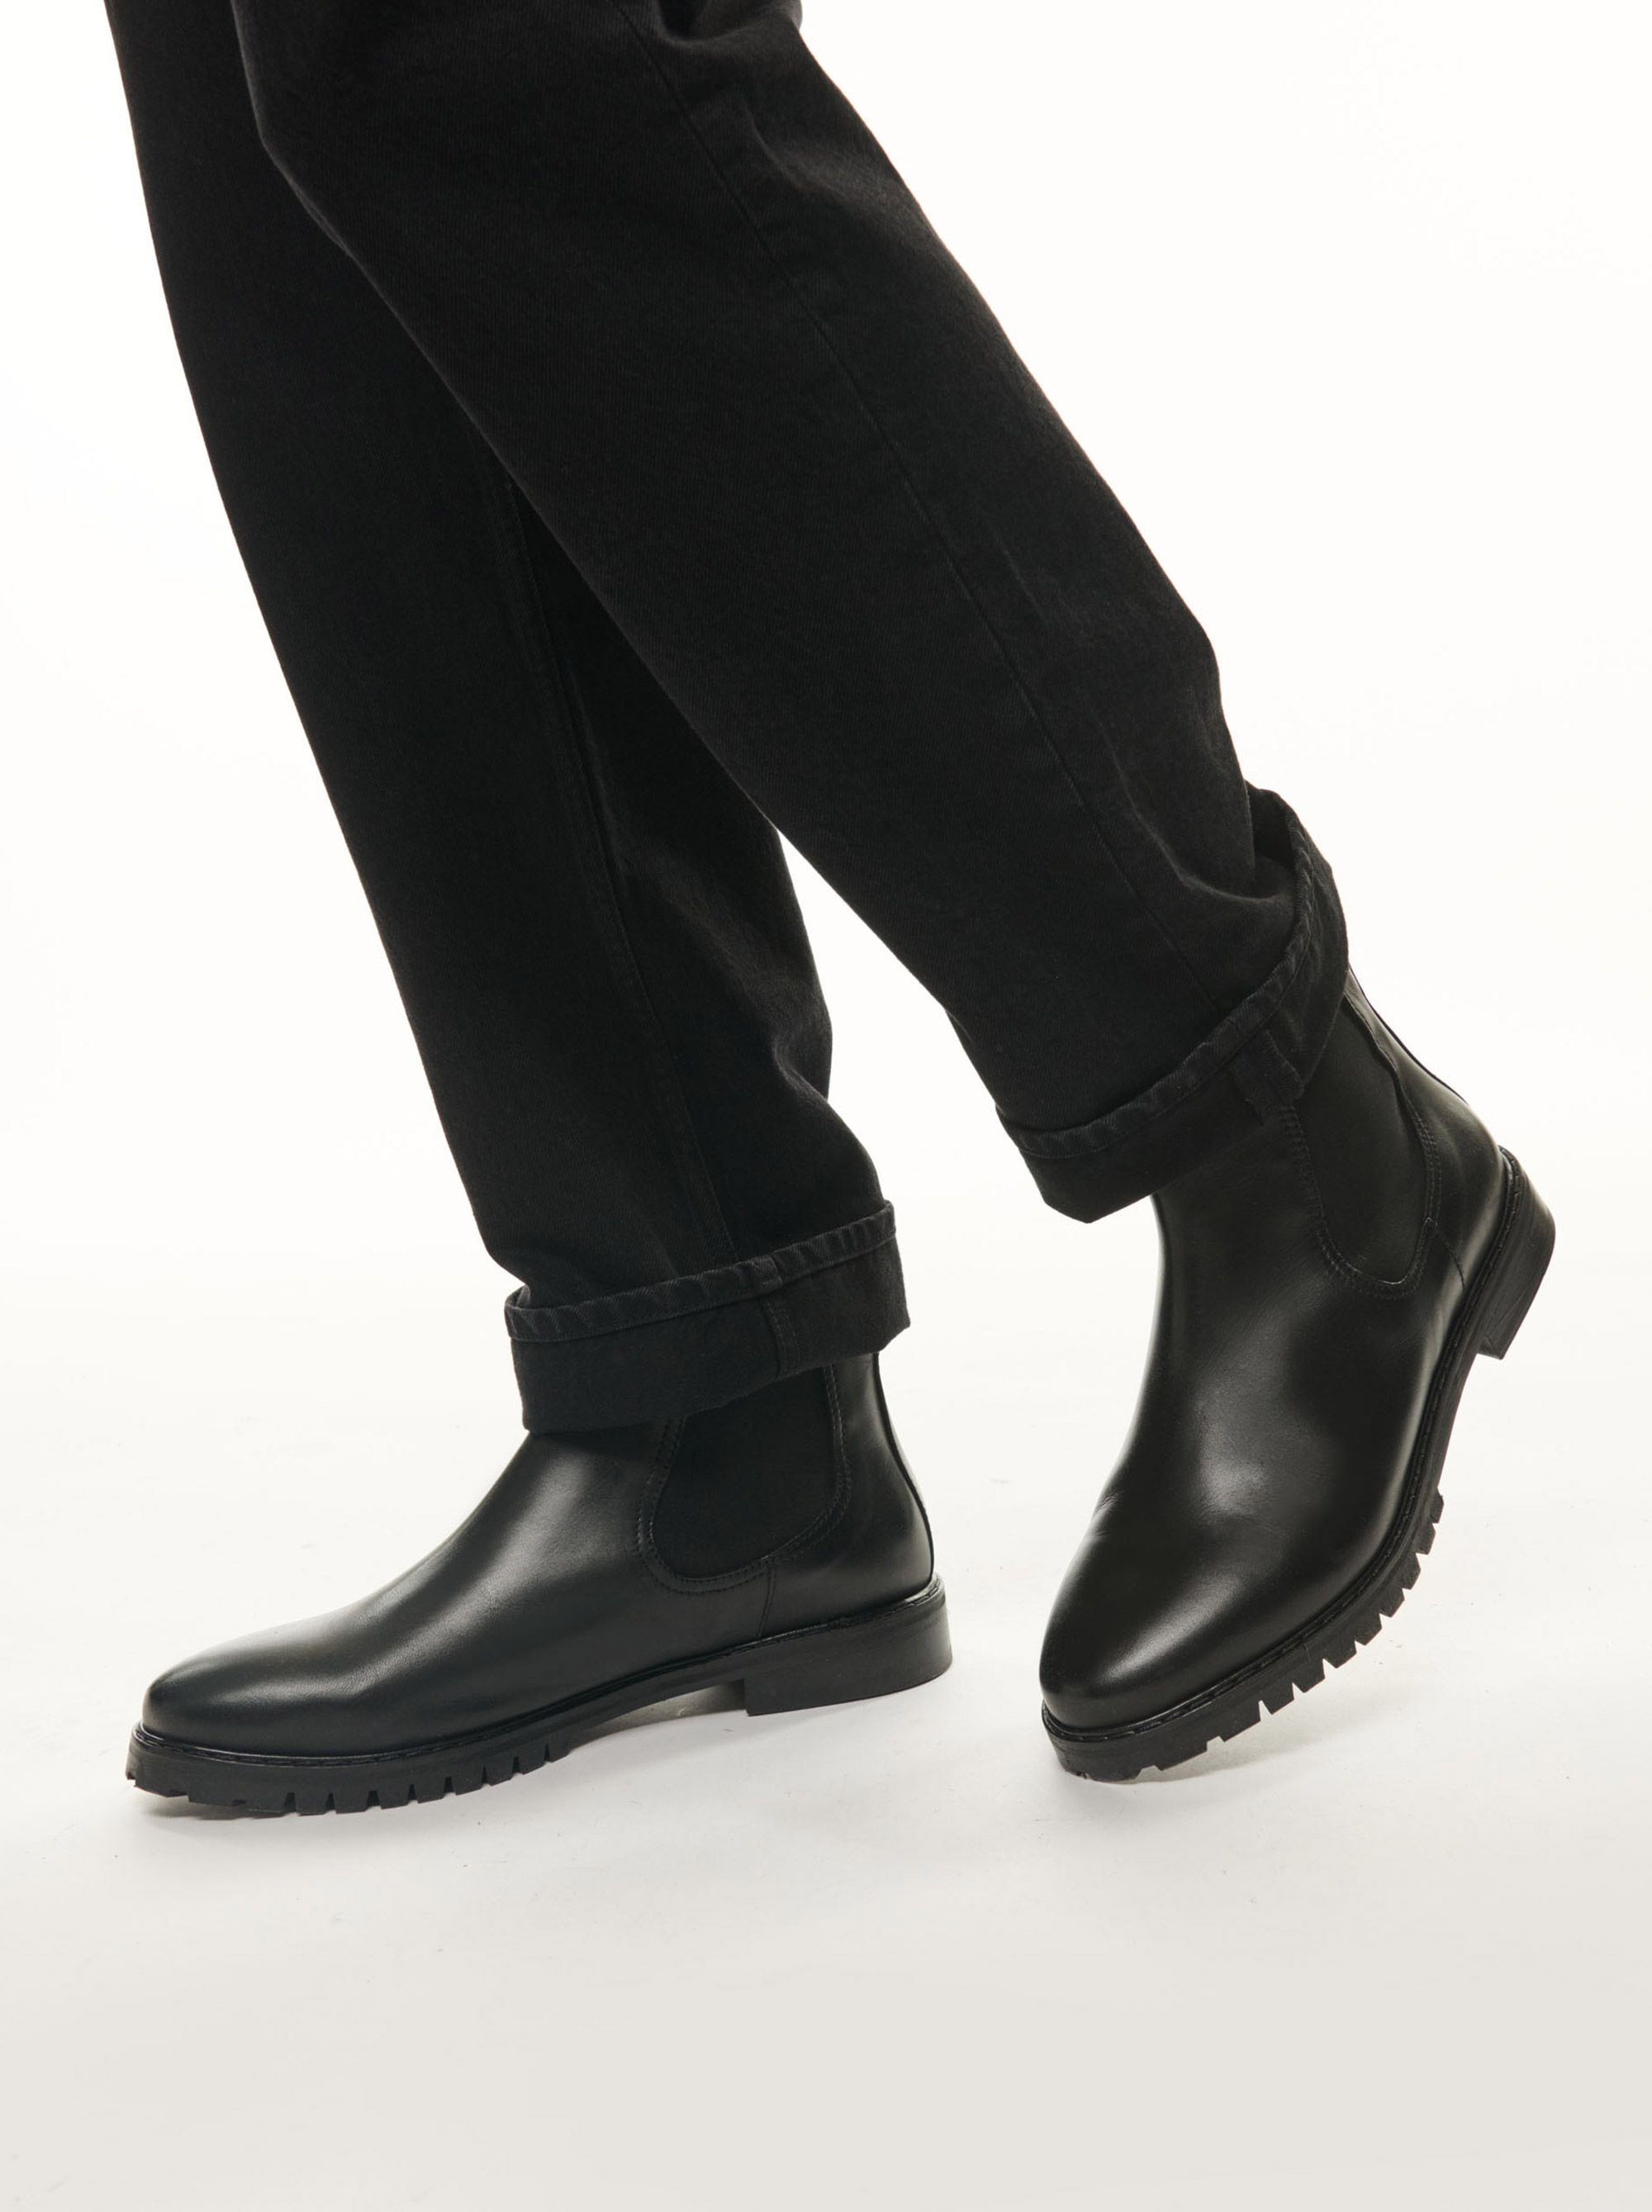 Teym - The Chelsea Boot - Black - 15